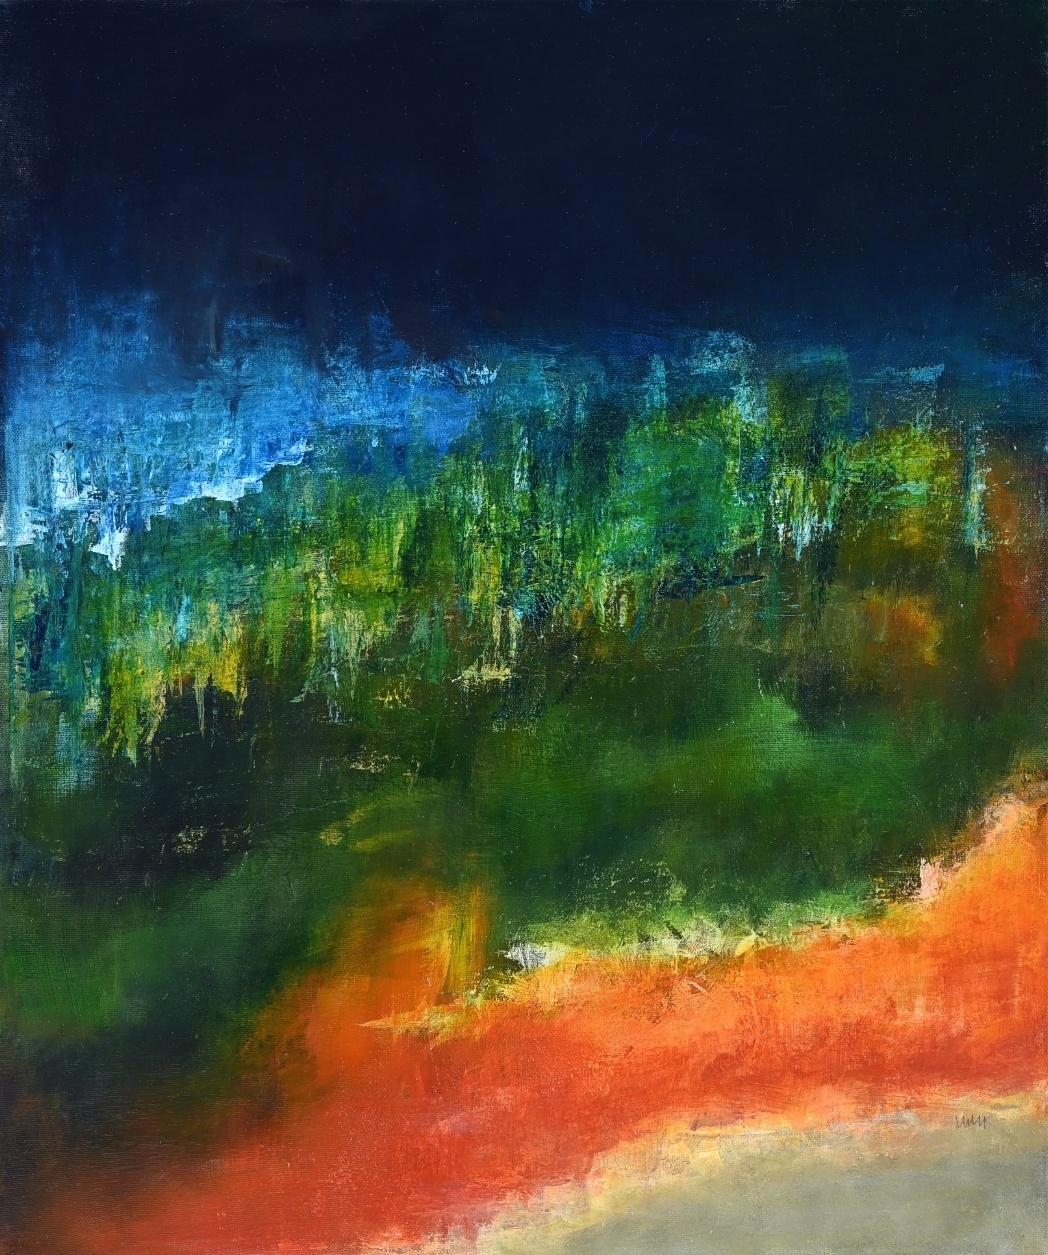 Maler des 20. Jahrhunderts » Gemälde Moderne Abstrakte Malerei